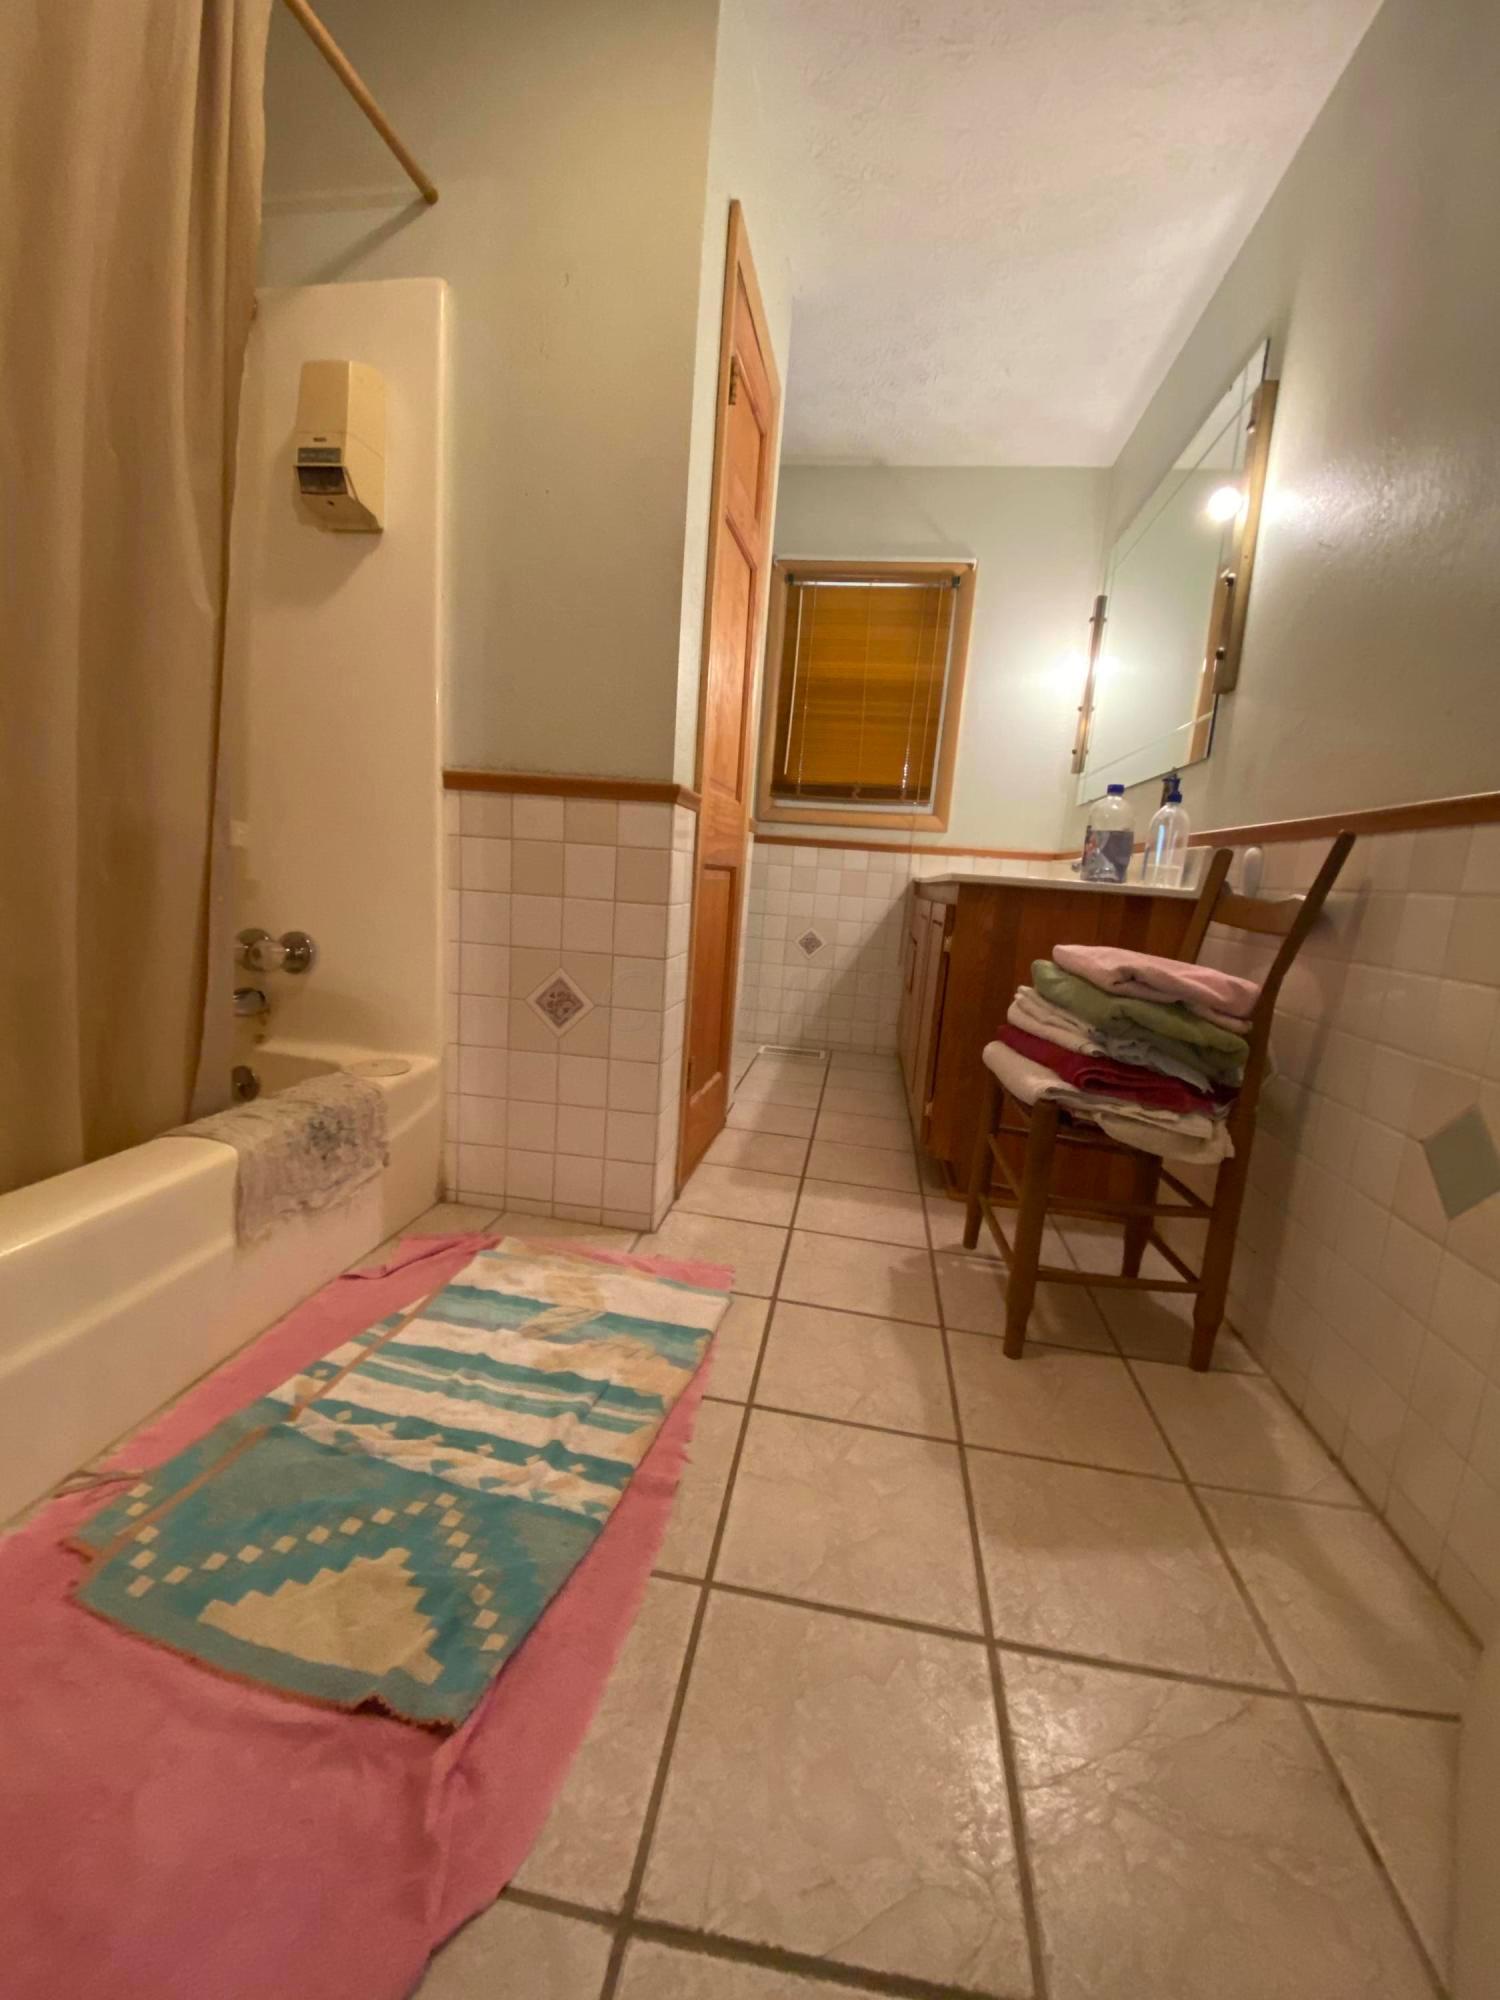 2377 Pumpkinvine Road, Lancaster, Ohio 43130, 2 Bedrooms Bedrooms, ,2 BathroomsBathrooms,Residential,For Sale,Pumpkinvine,220032431